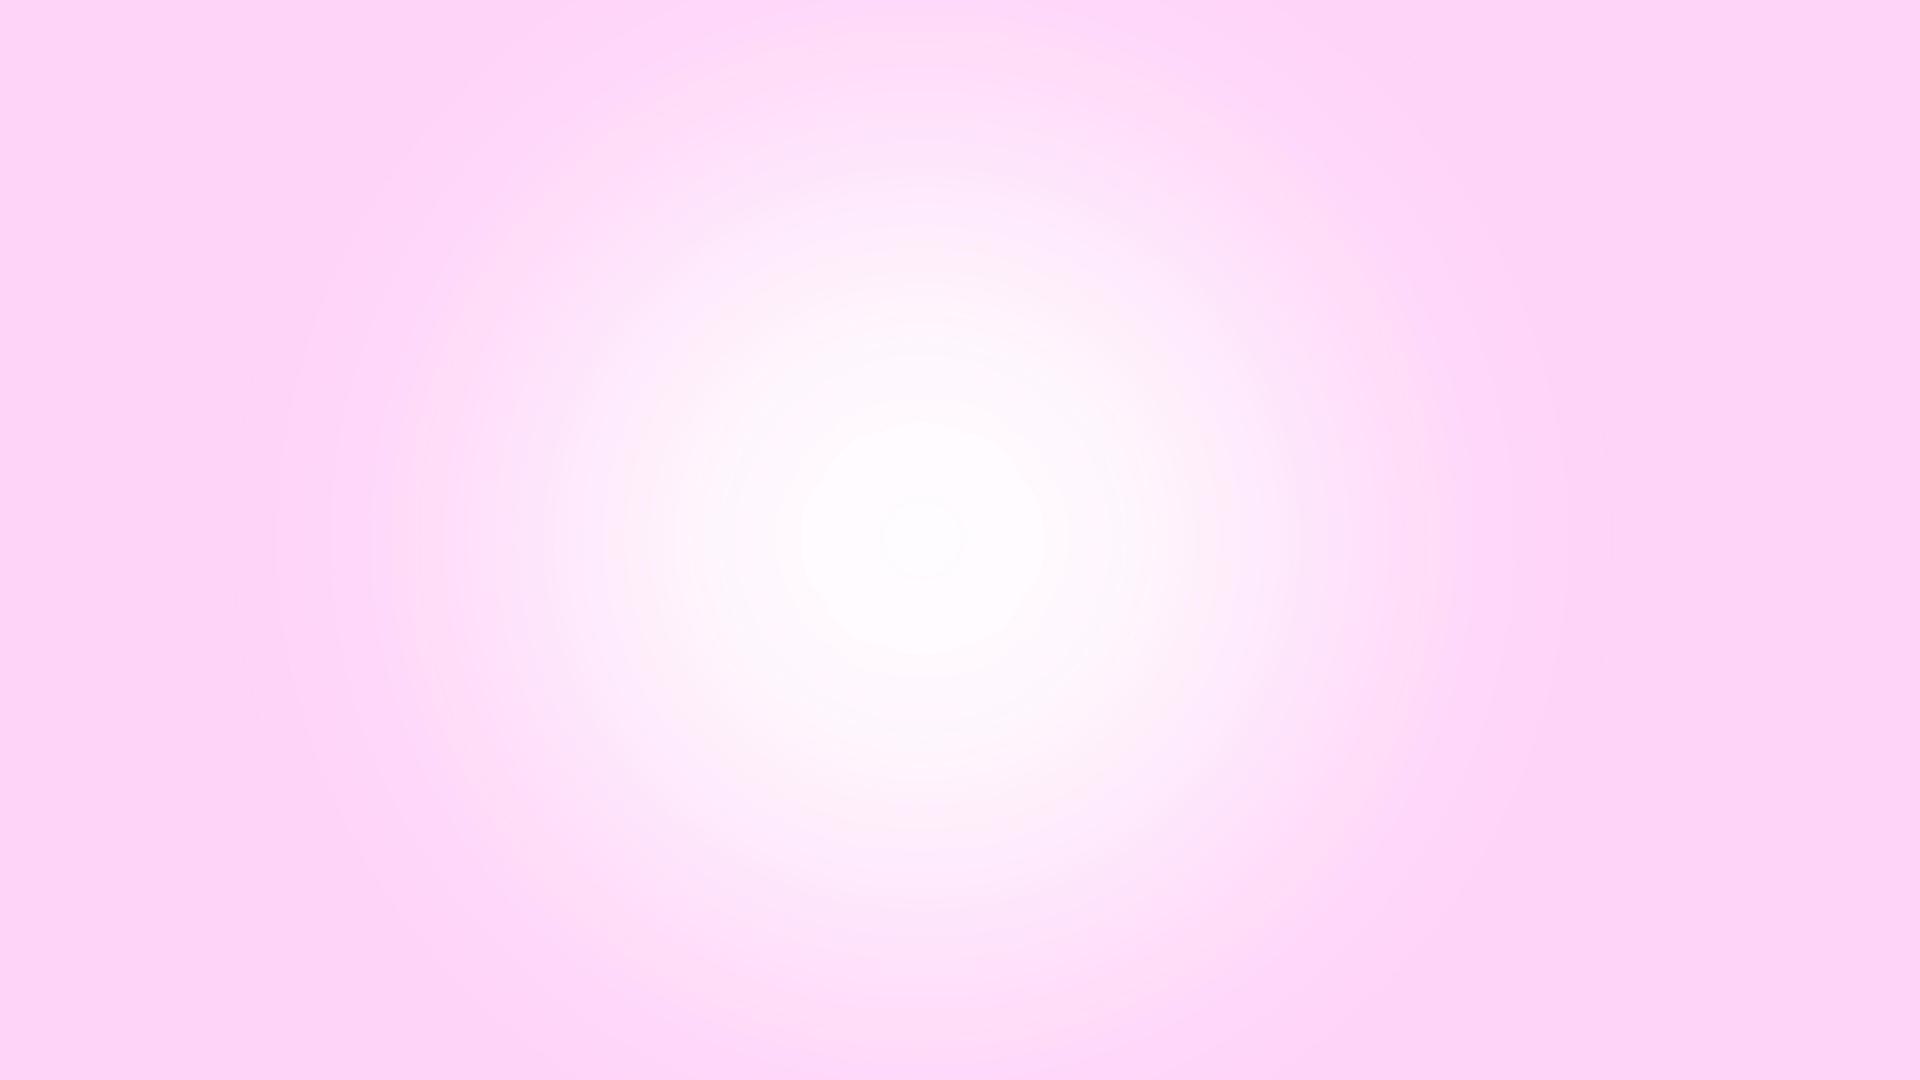 Home Screen Wallpaper With Quotes Light Pink Wallpapers Hd Pixelstalk Net